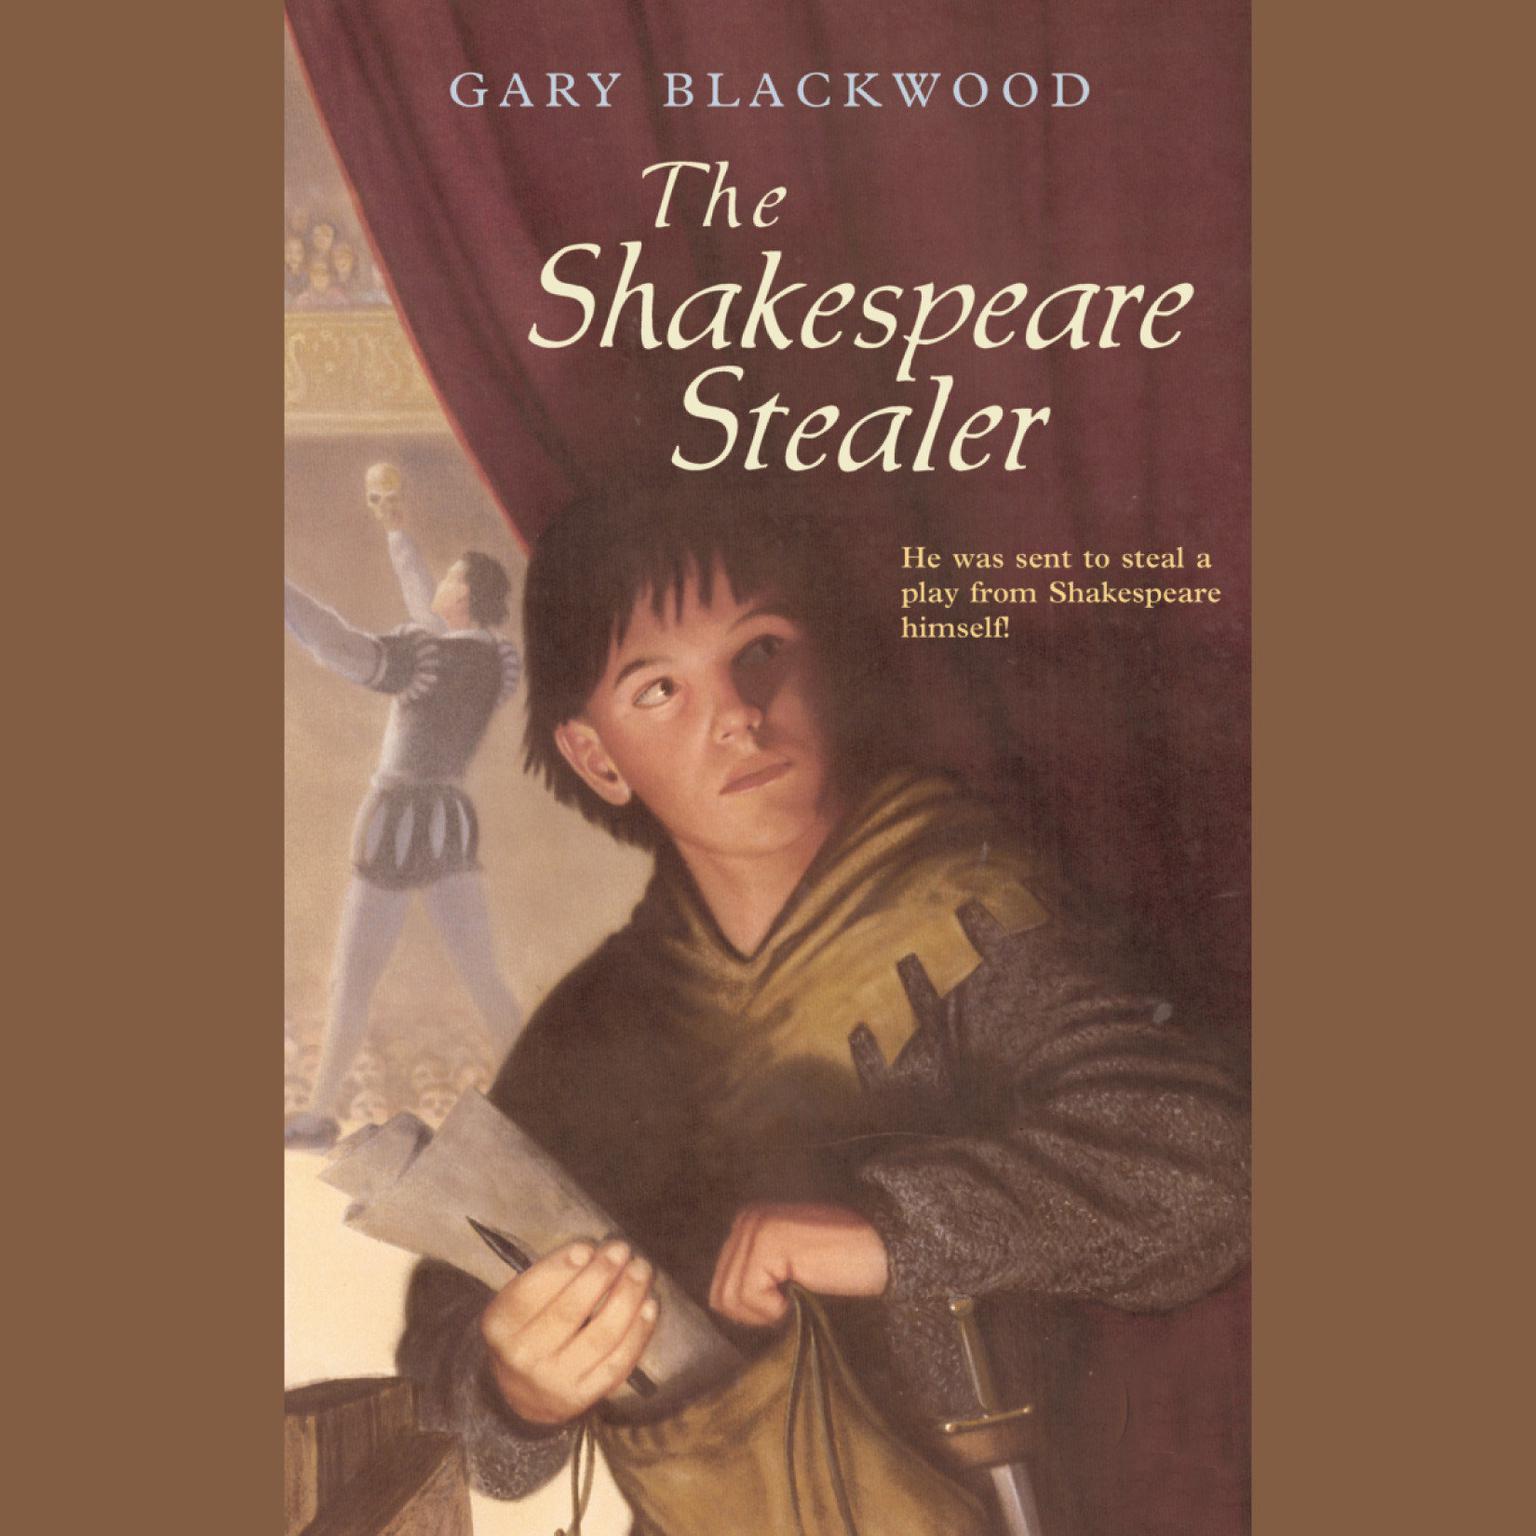 The Shakespeare Stealer Audiobook, by Gary Blackwood